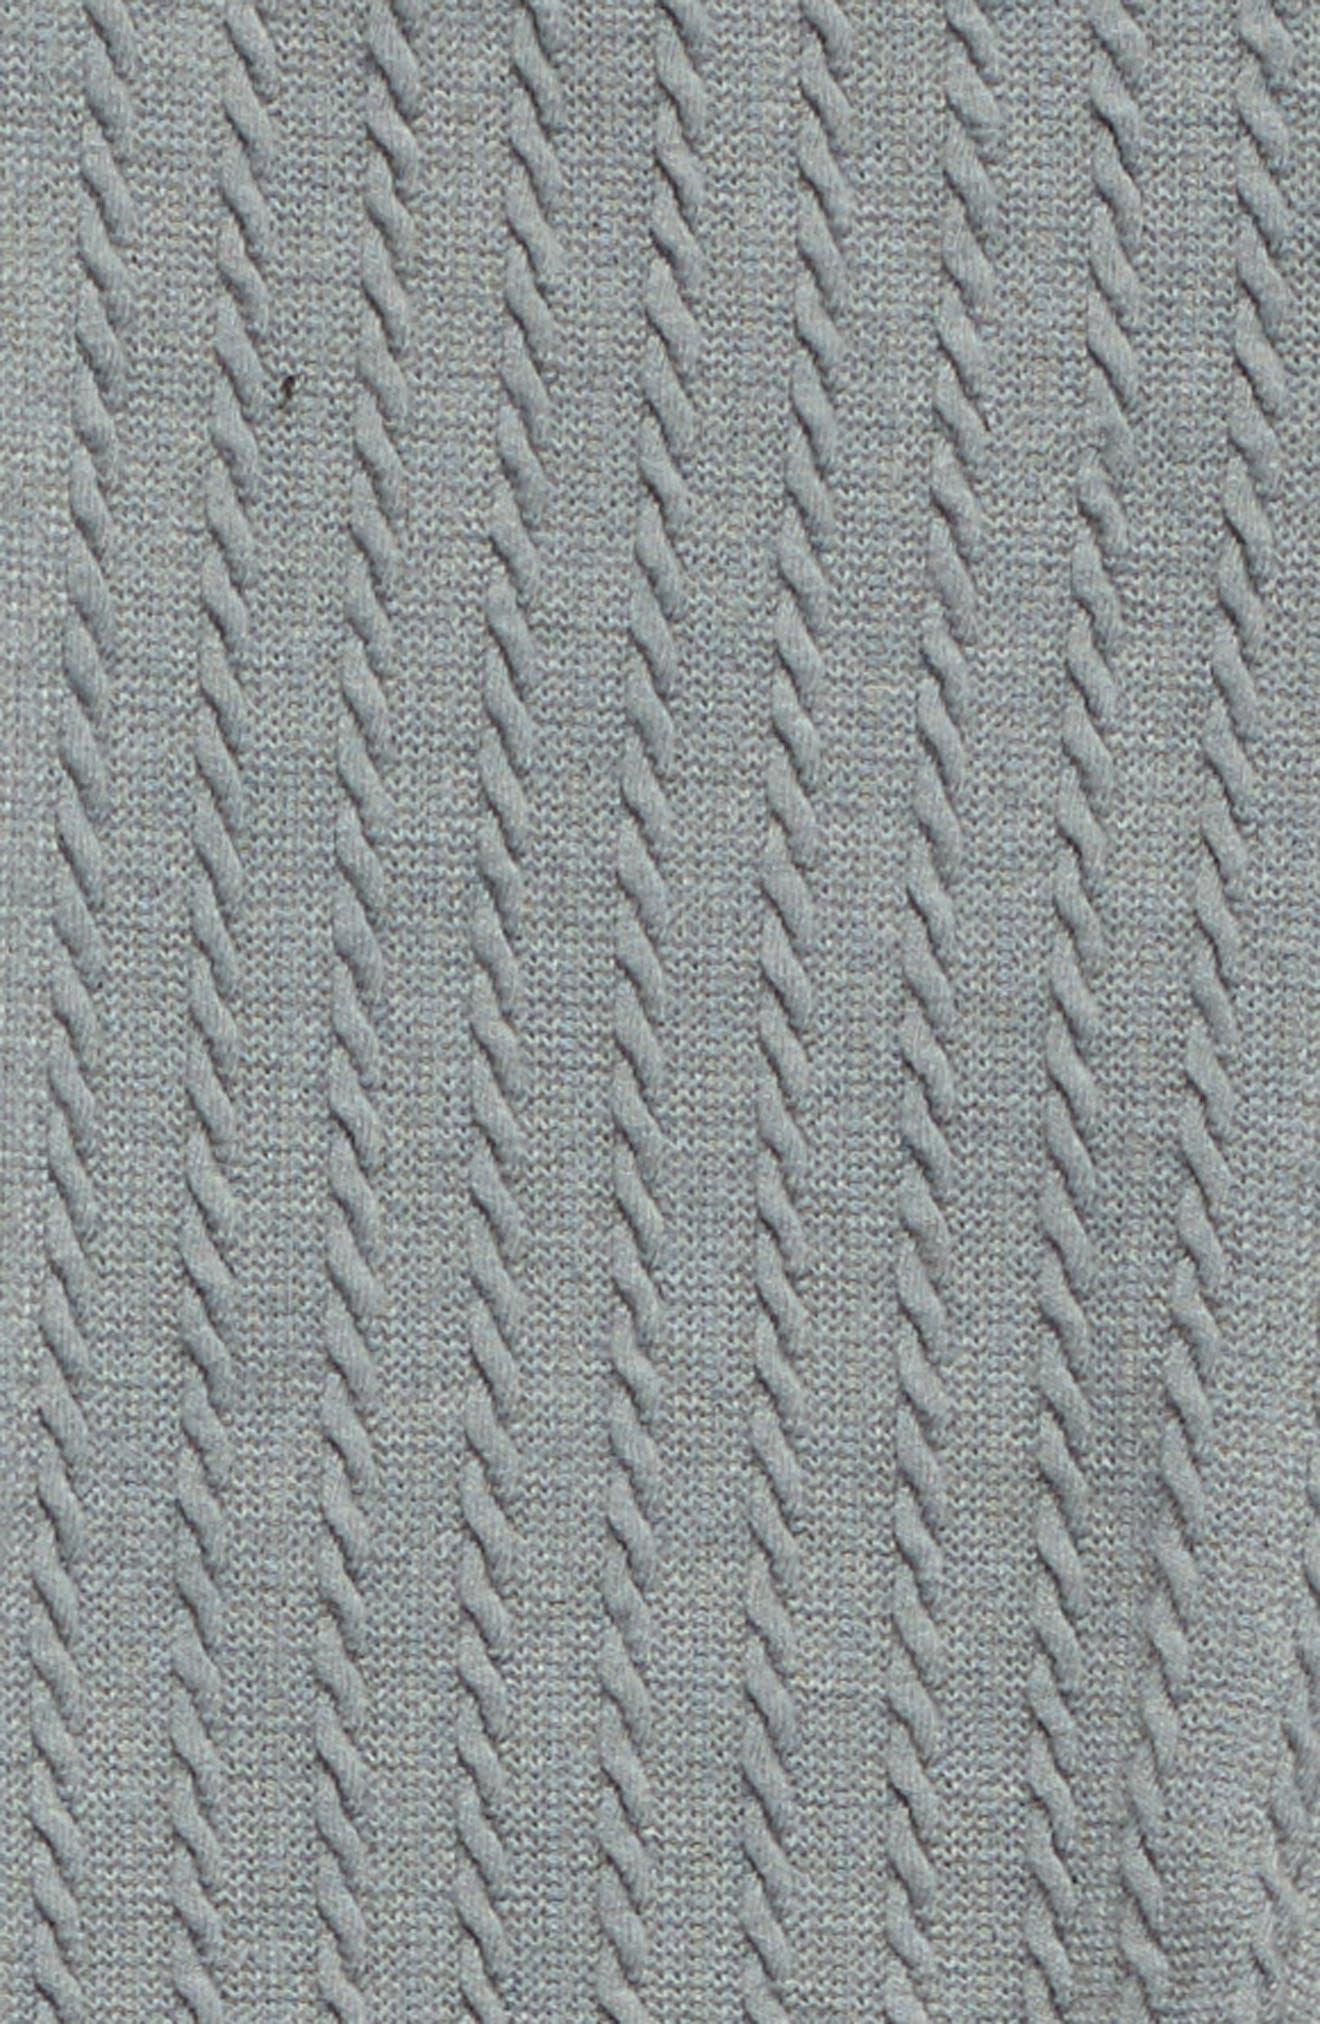 Cable Knit Leggings,                             Alternate thumbnail 9, color,